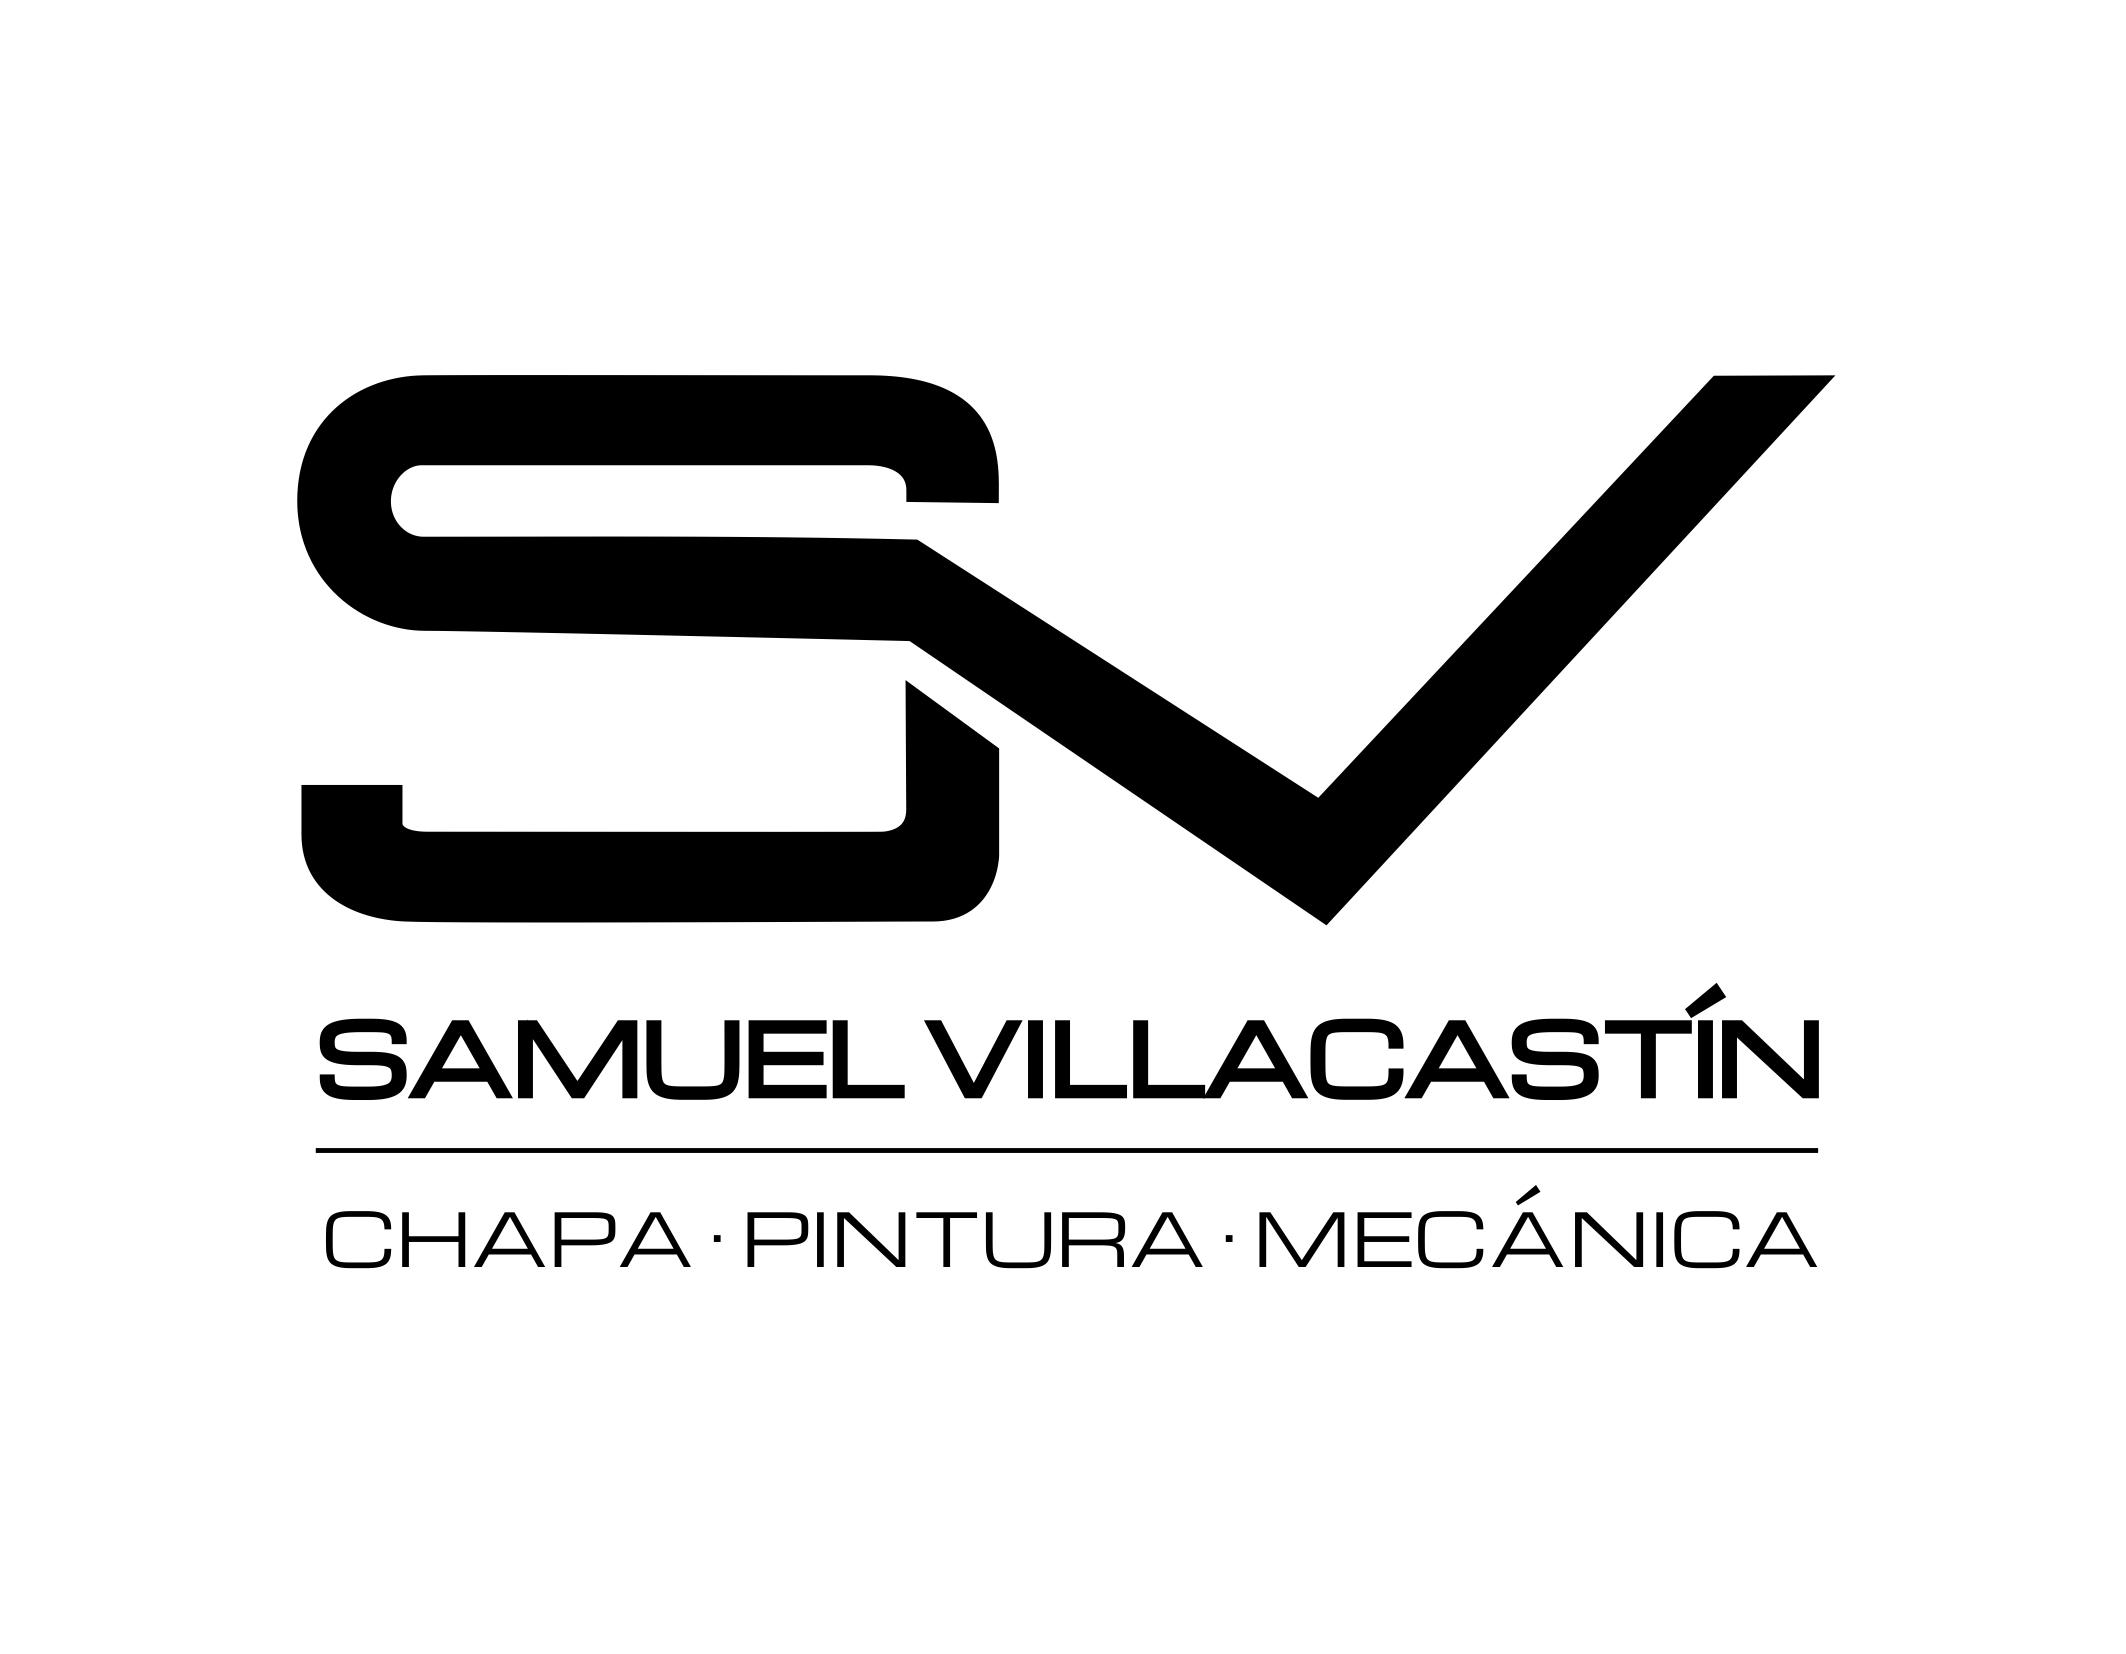 Taller Chapa, Pintura y Mecánica Samuel Villacastín